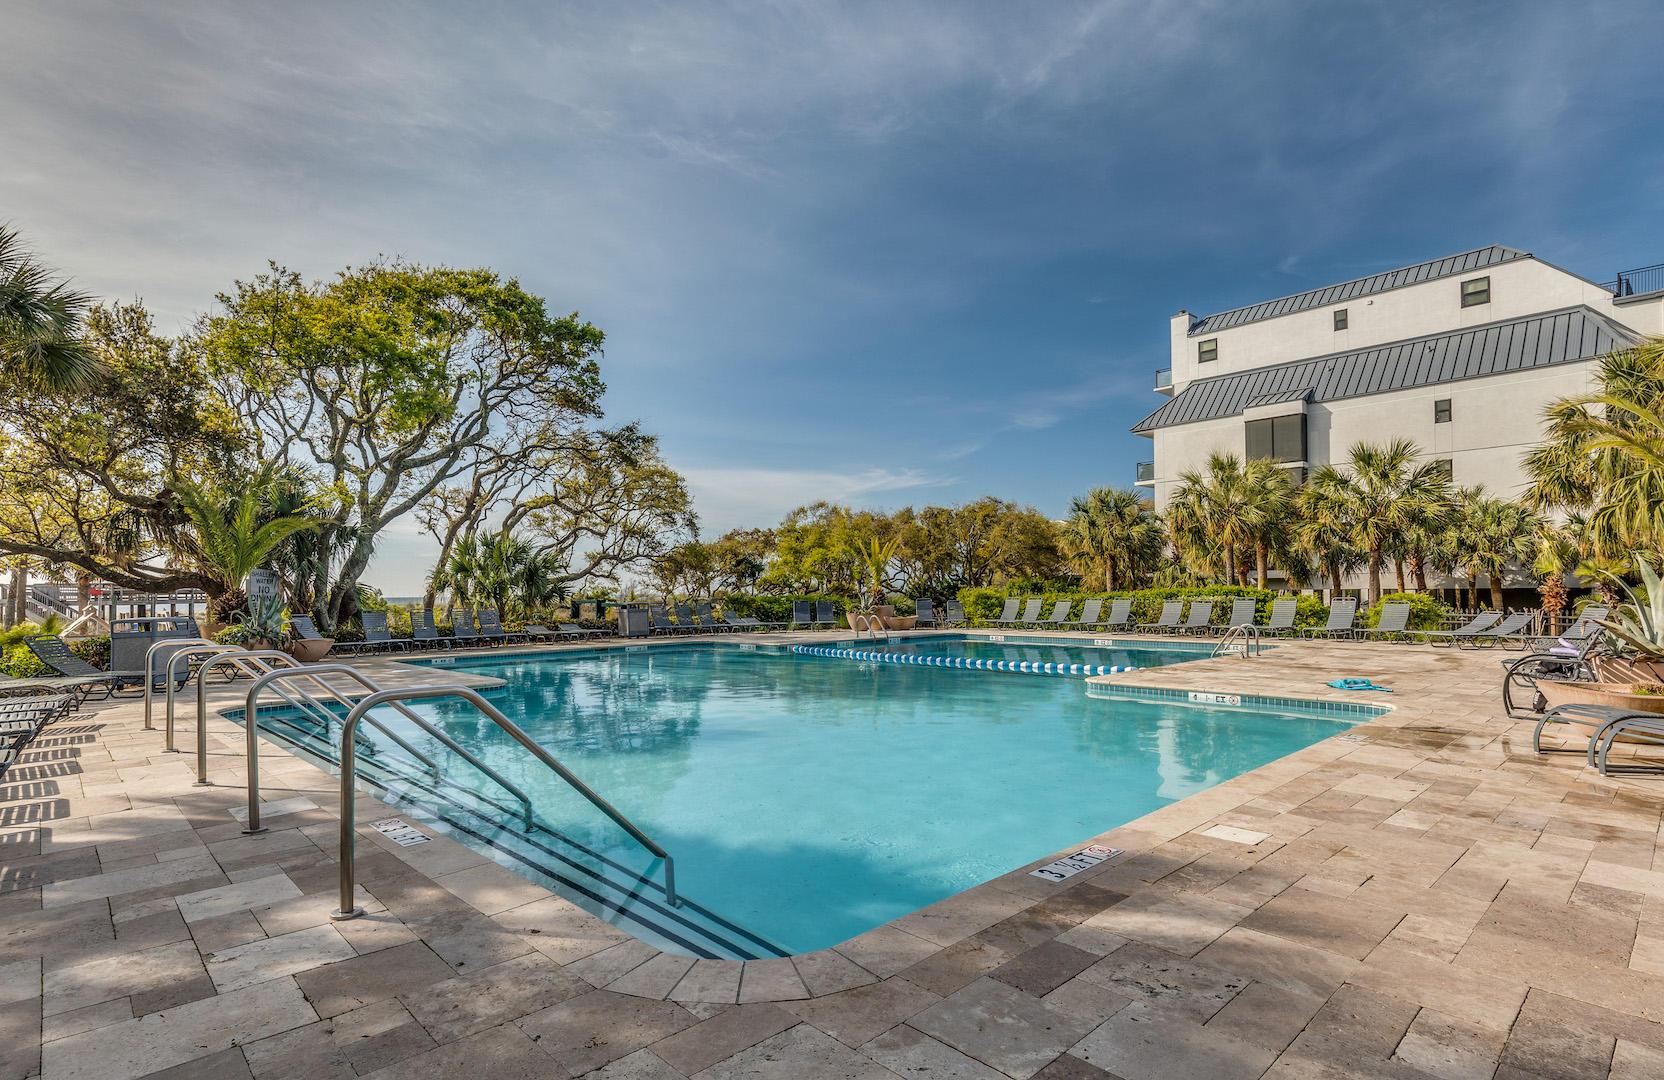 Shipwatch Villa Homes For Sale - 104-A Shipwatch, Isle of Palms, SC - 24